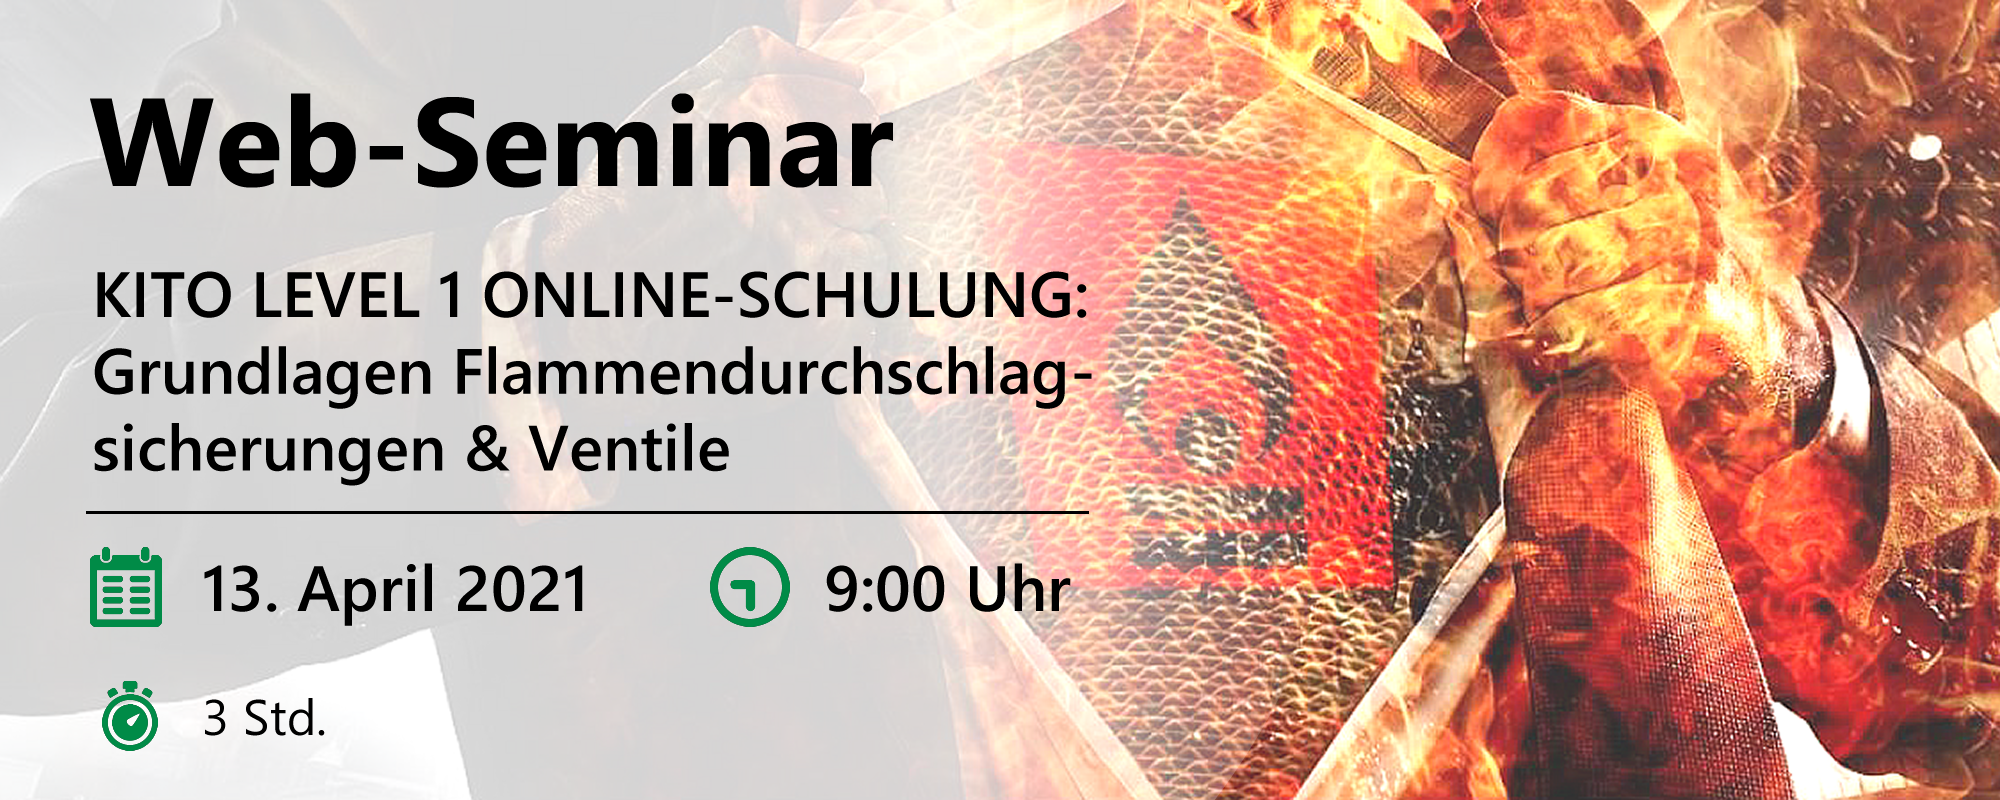 Web-Seminar am 13.04.2021